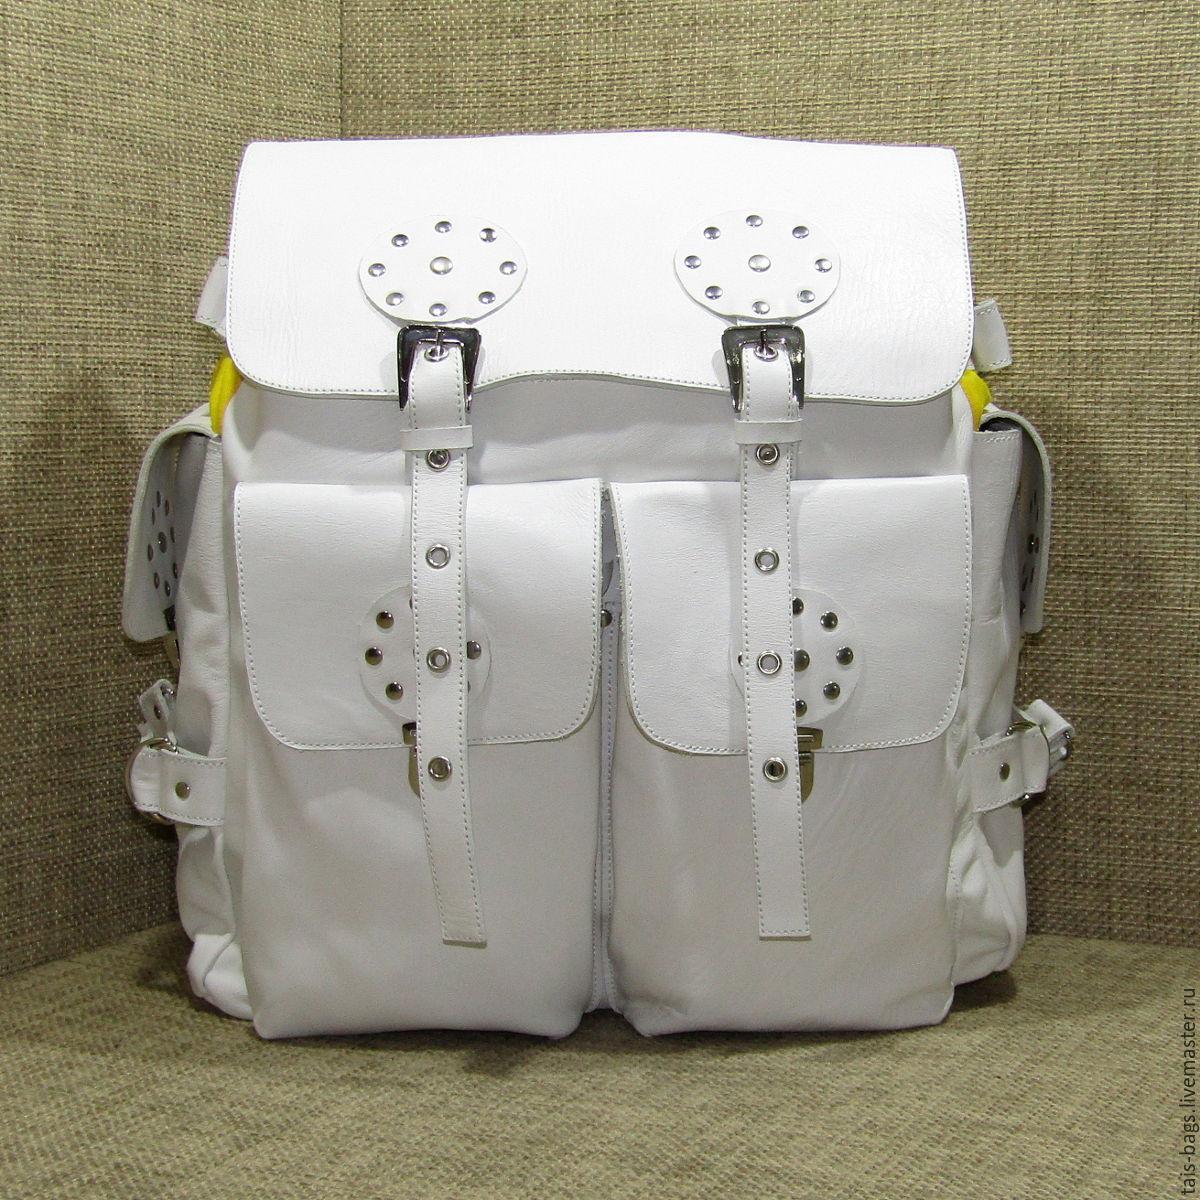 Womens leather backpack white CLOUD, Backpacks, Izhevsk,  Фото №1